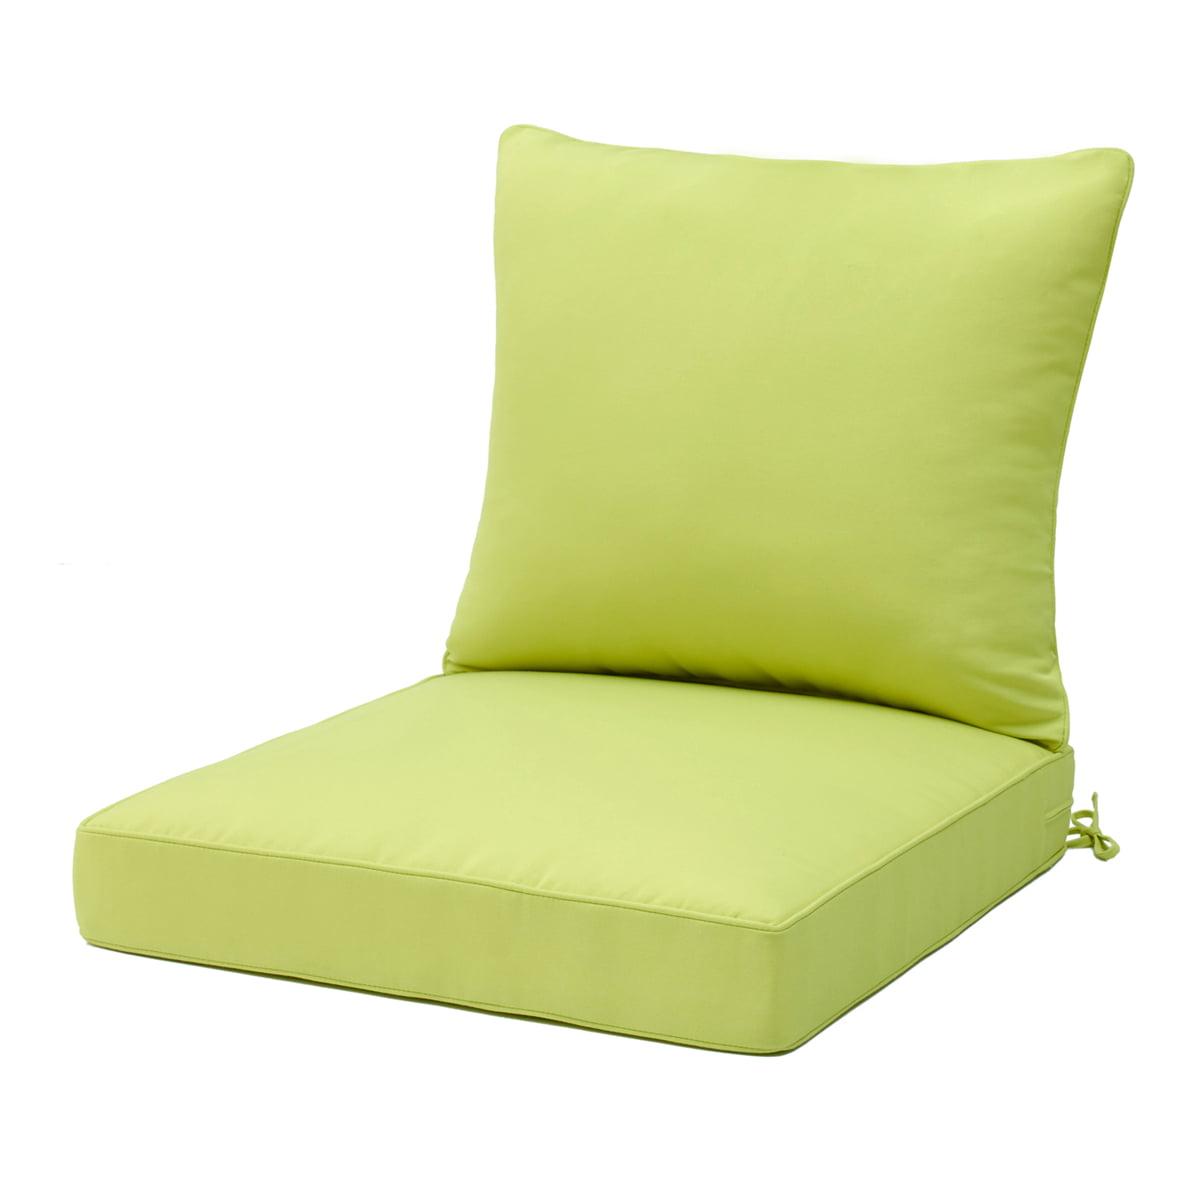 Outdoor Indoor High Rebound Foam High Back Dining Chair Cushion Seat Mat Cushion